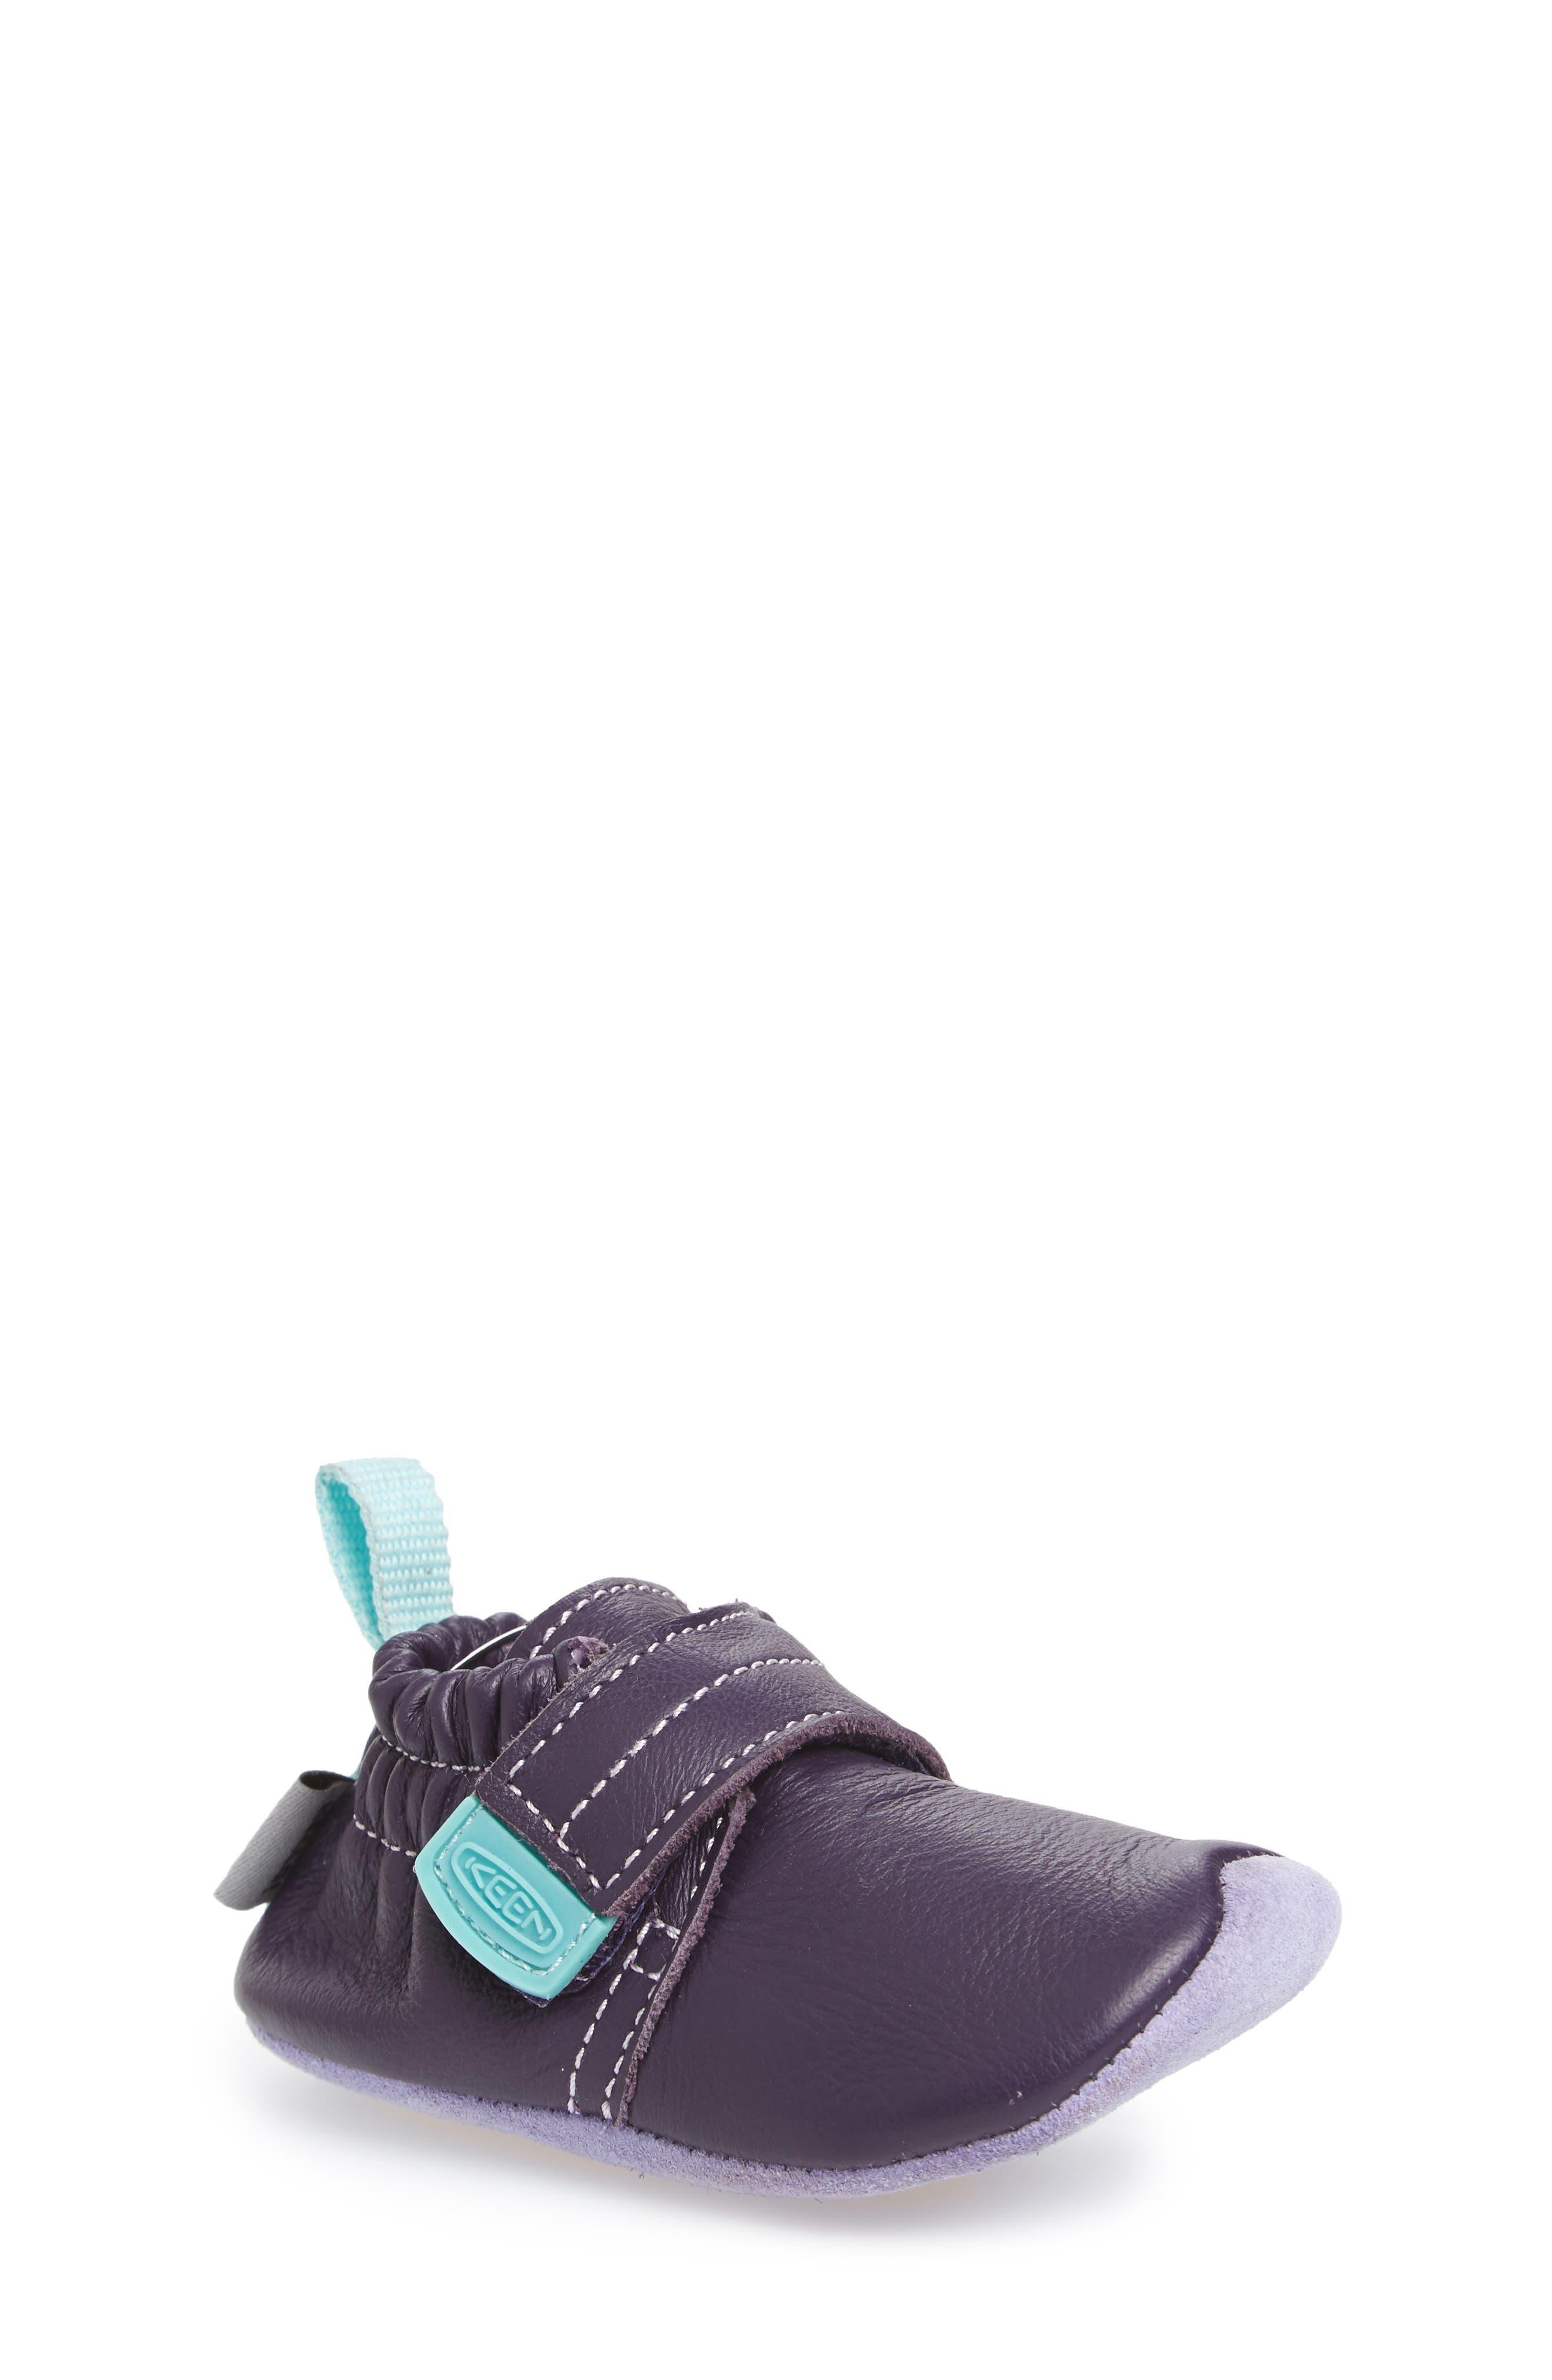 Leo Crib Shoe,                         Main,                         color, PURPLE / SWEET LAVENDER